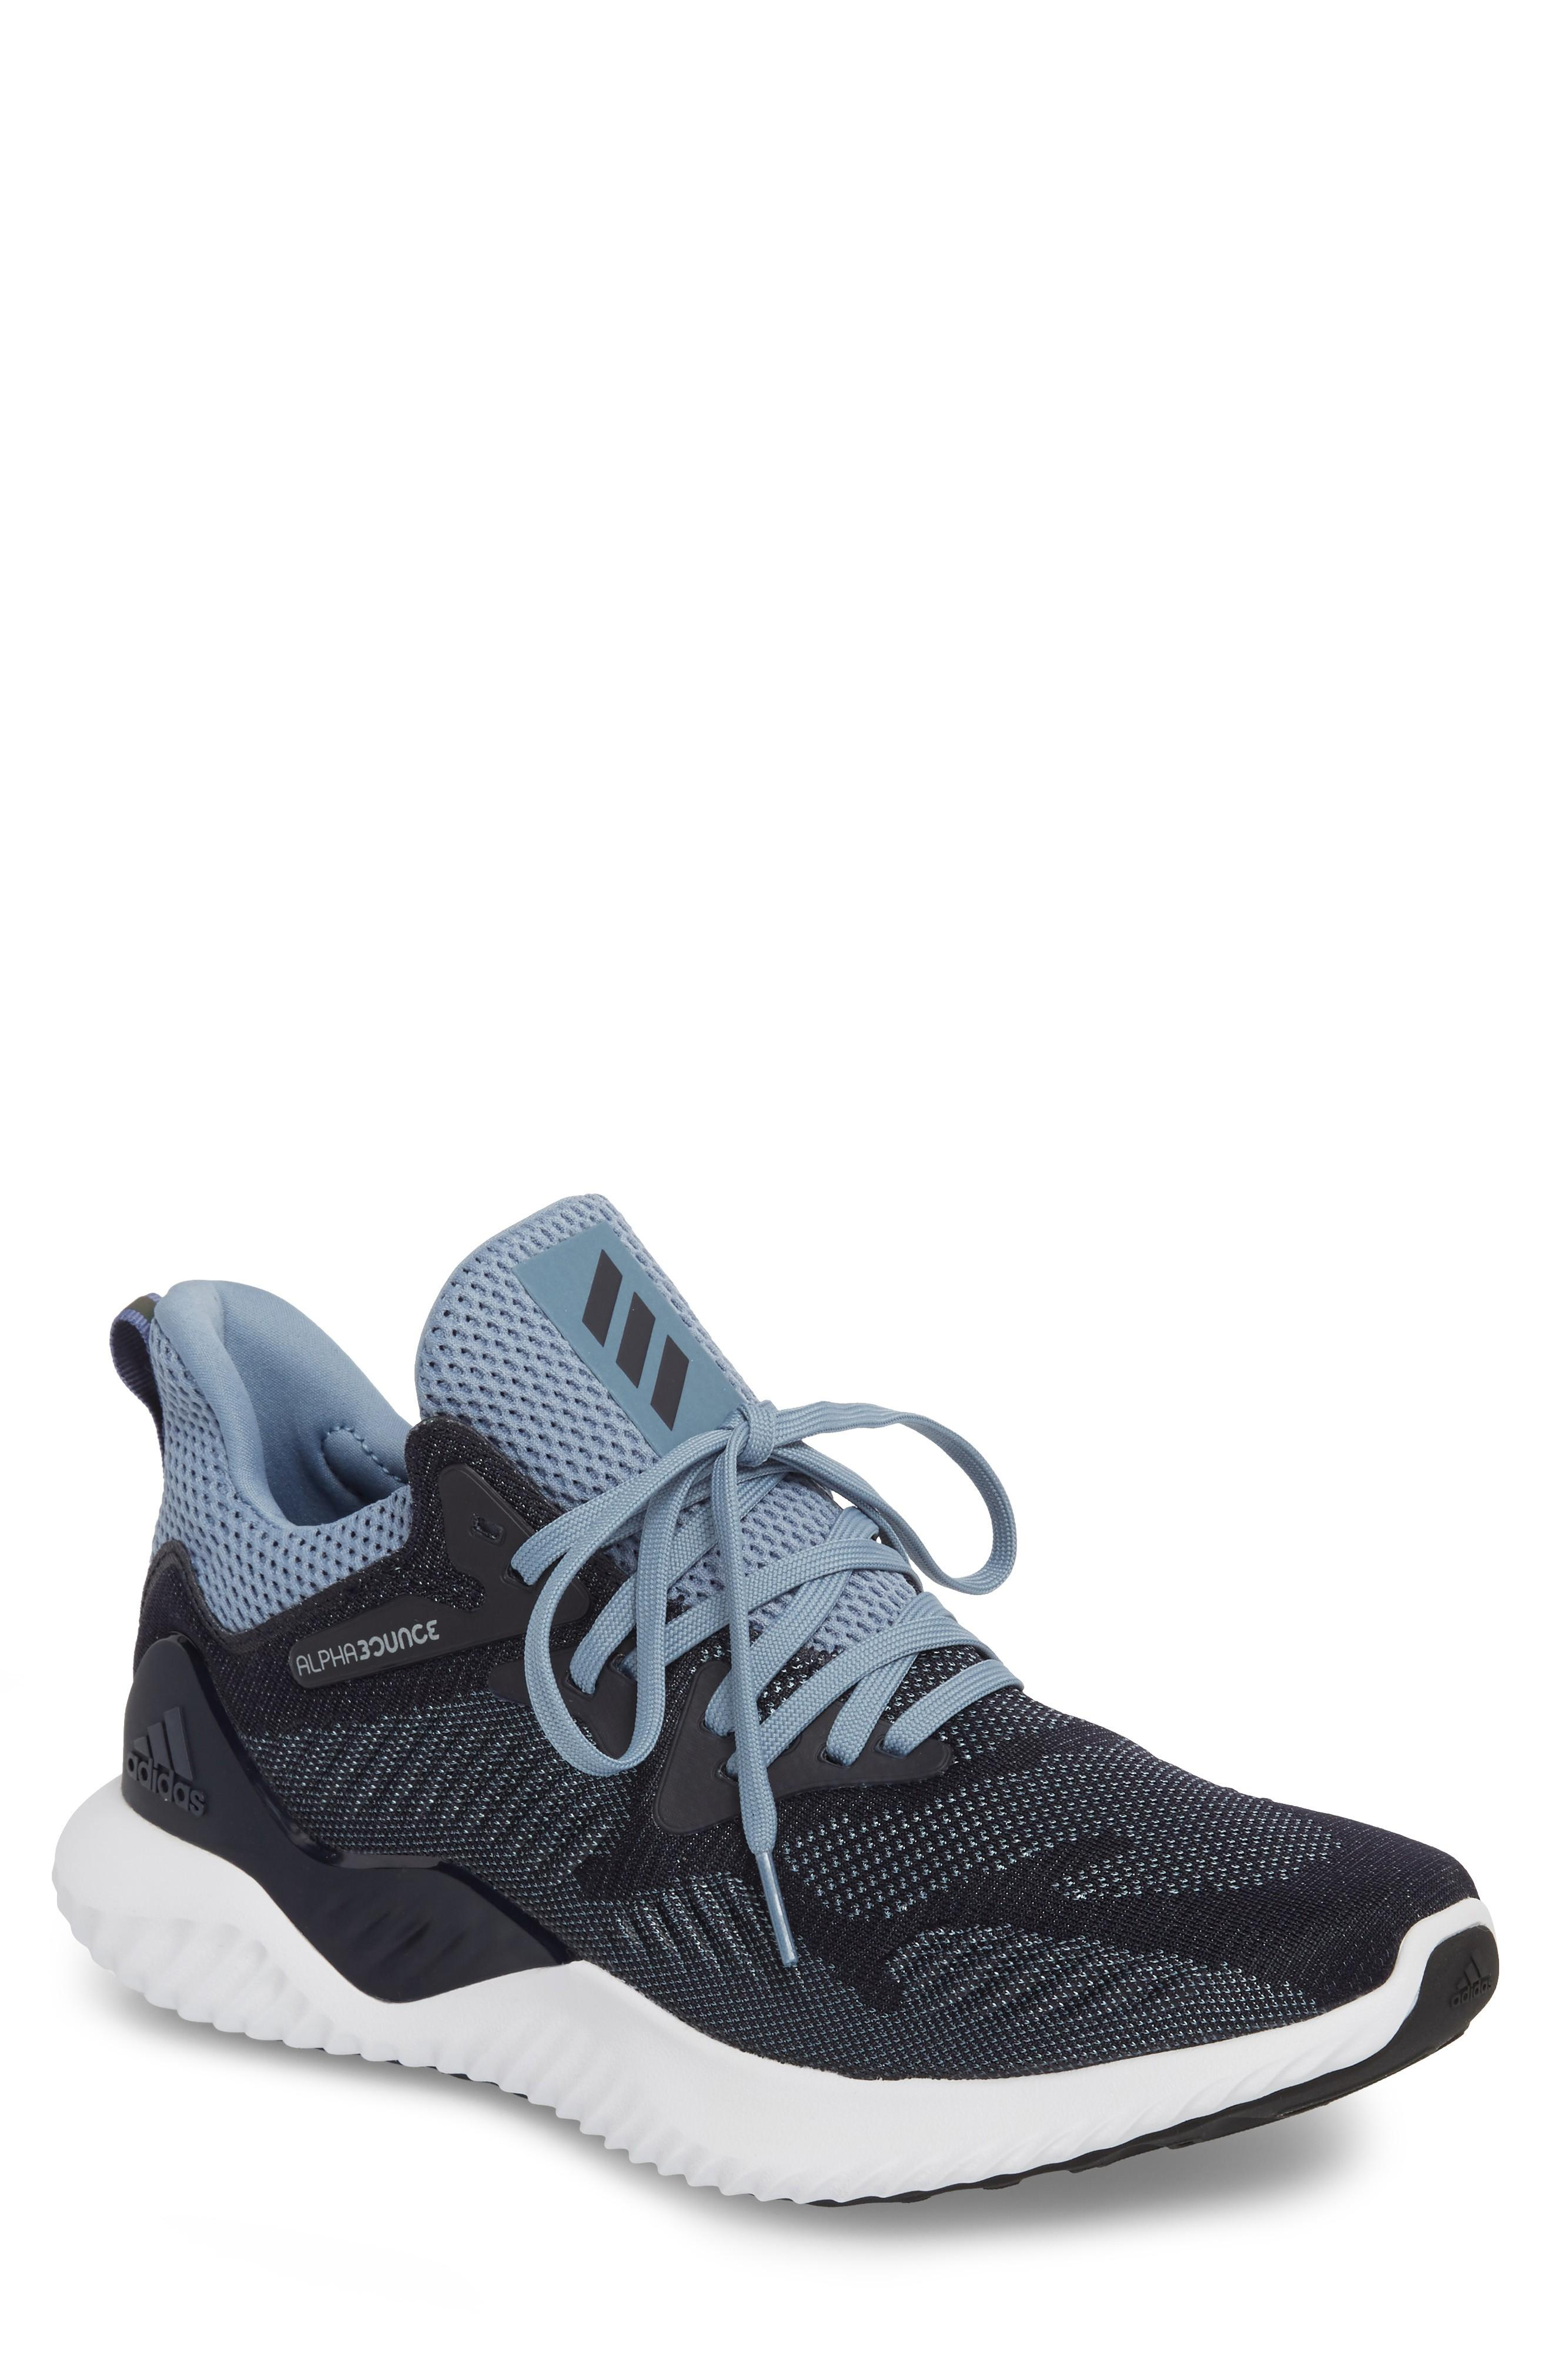 2bd110f1968b0 Adidas Originals Alphabounce Beyond Knit Running Shoe In Legend Ink ...